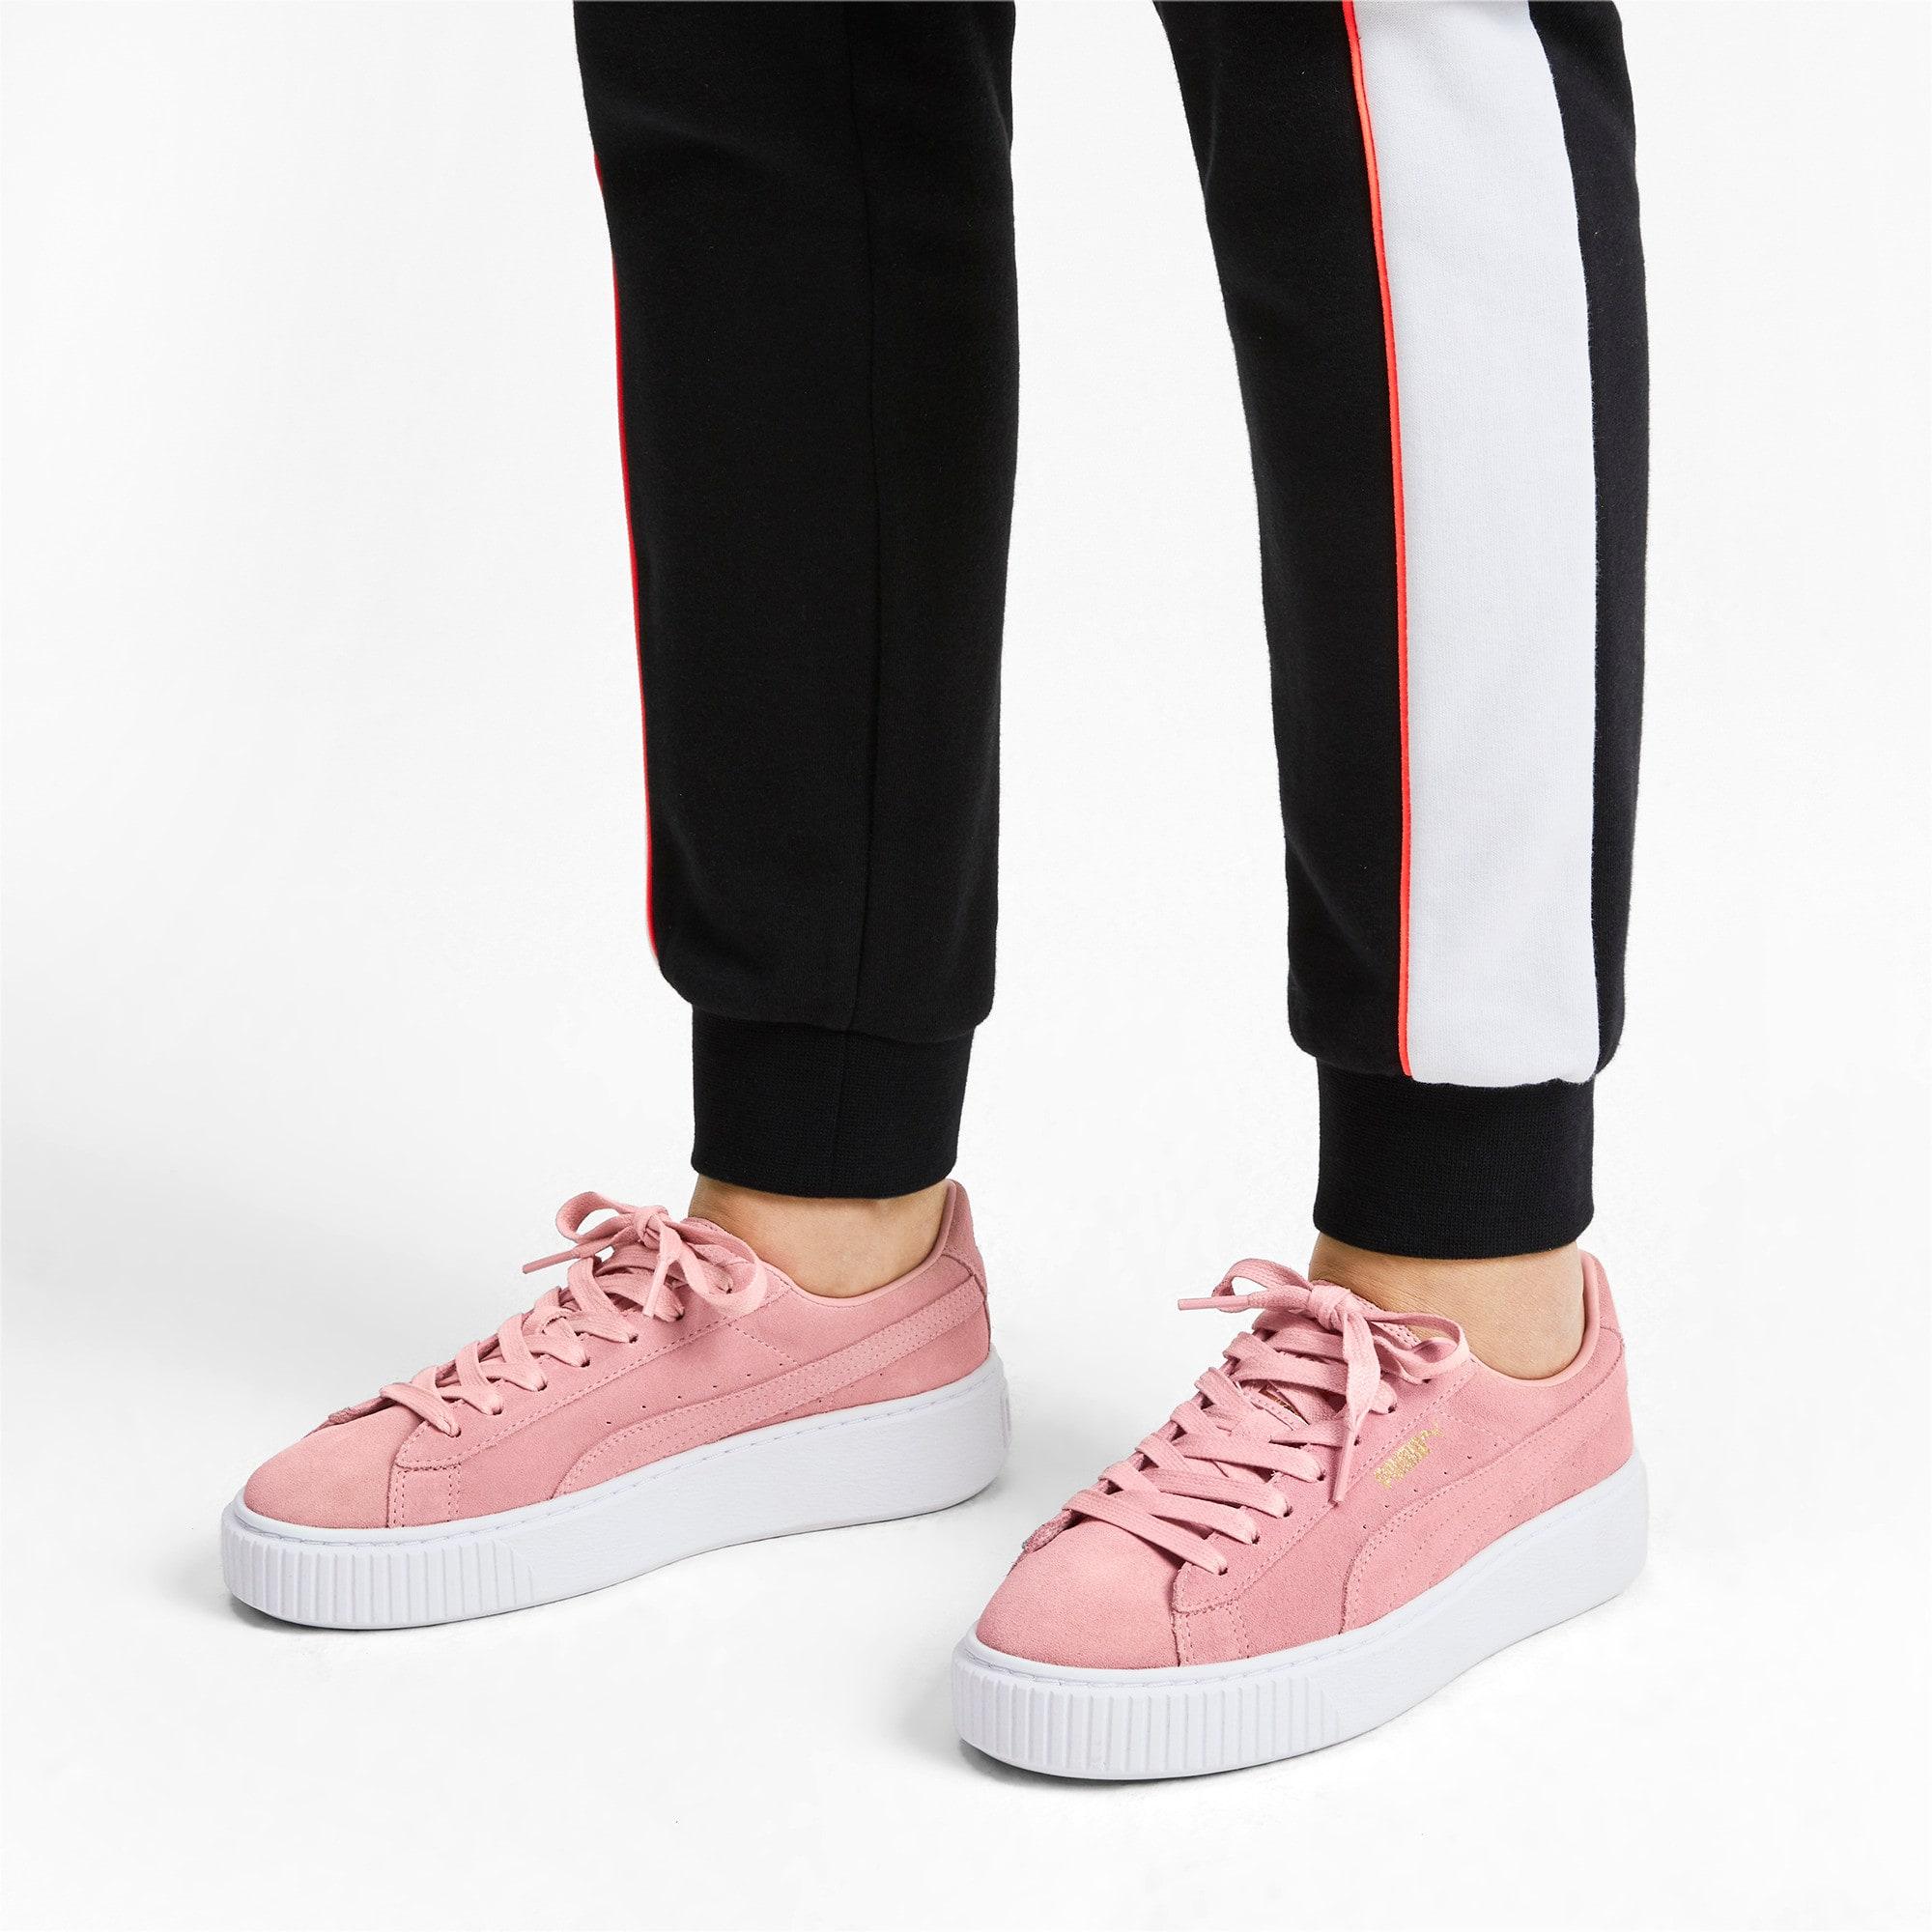 Thumbnail 3 of Suede Platform Women's Sneakers, Bridal Rose-Puma Team Gold, medium